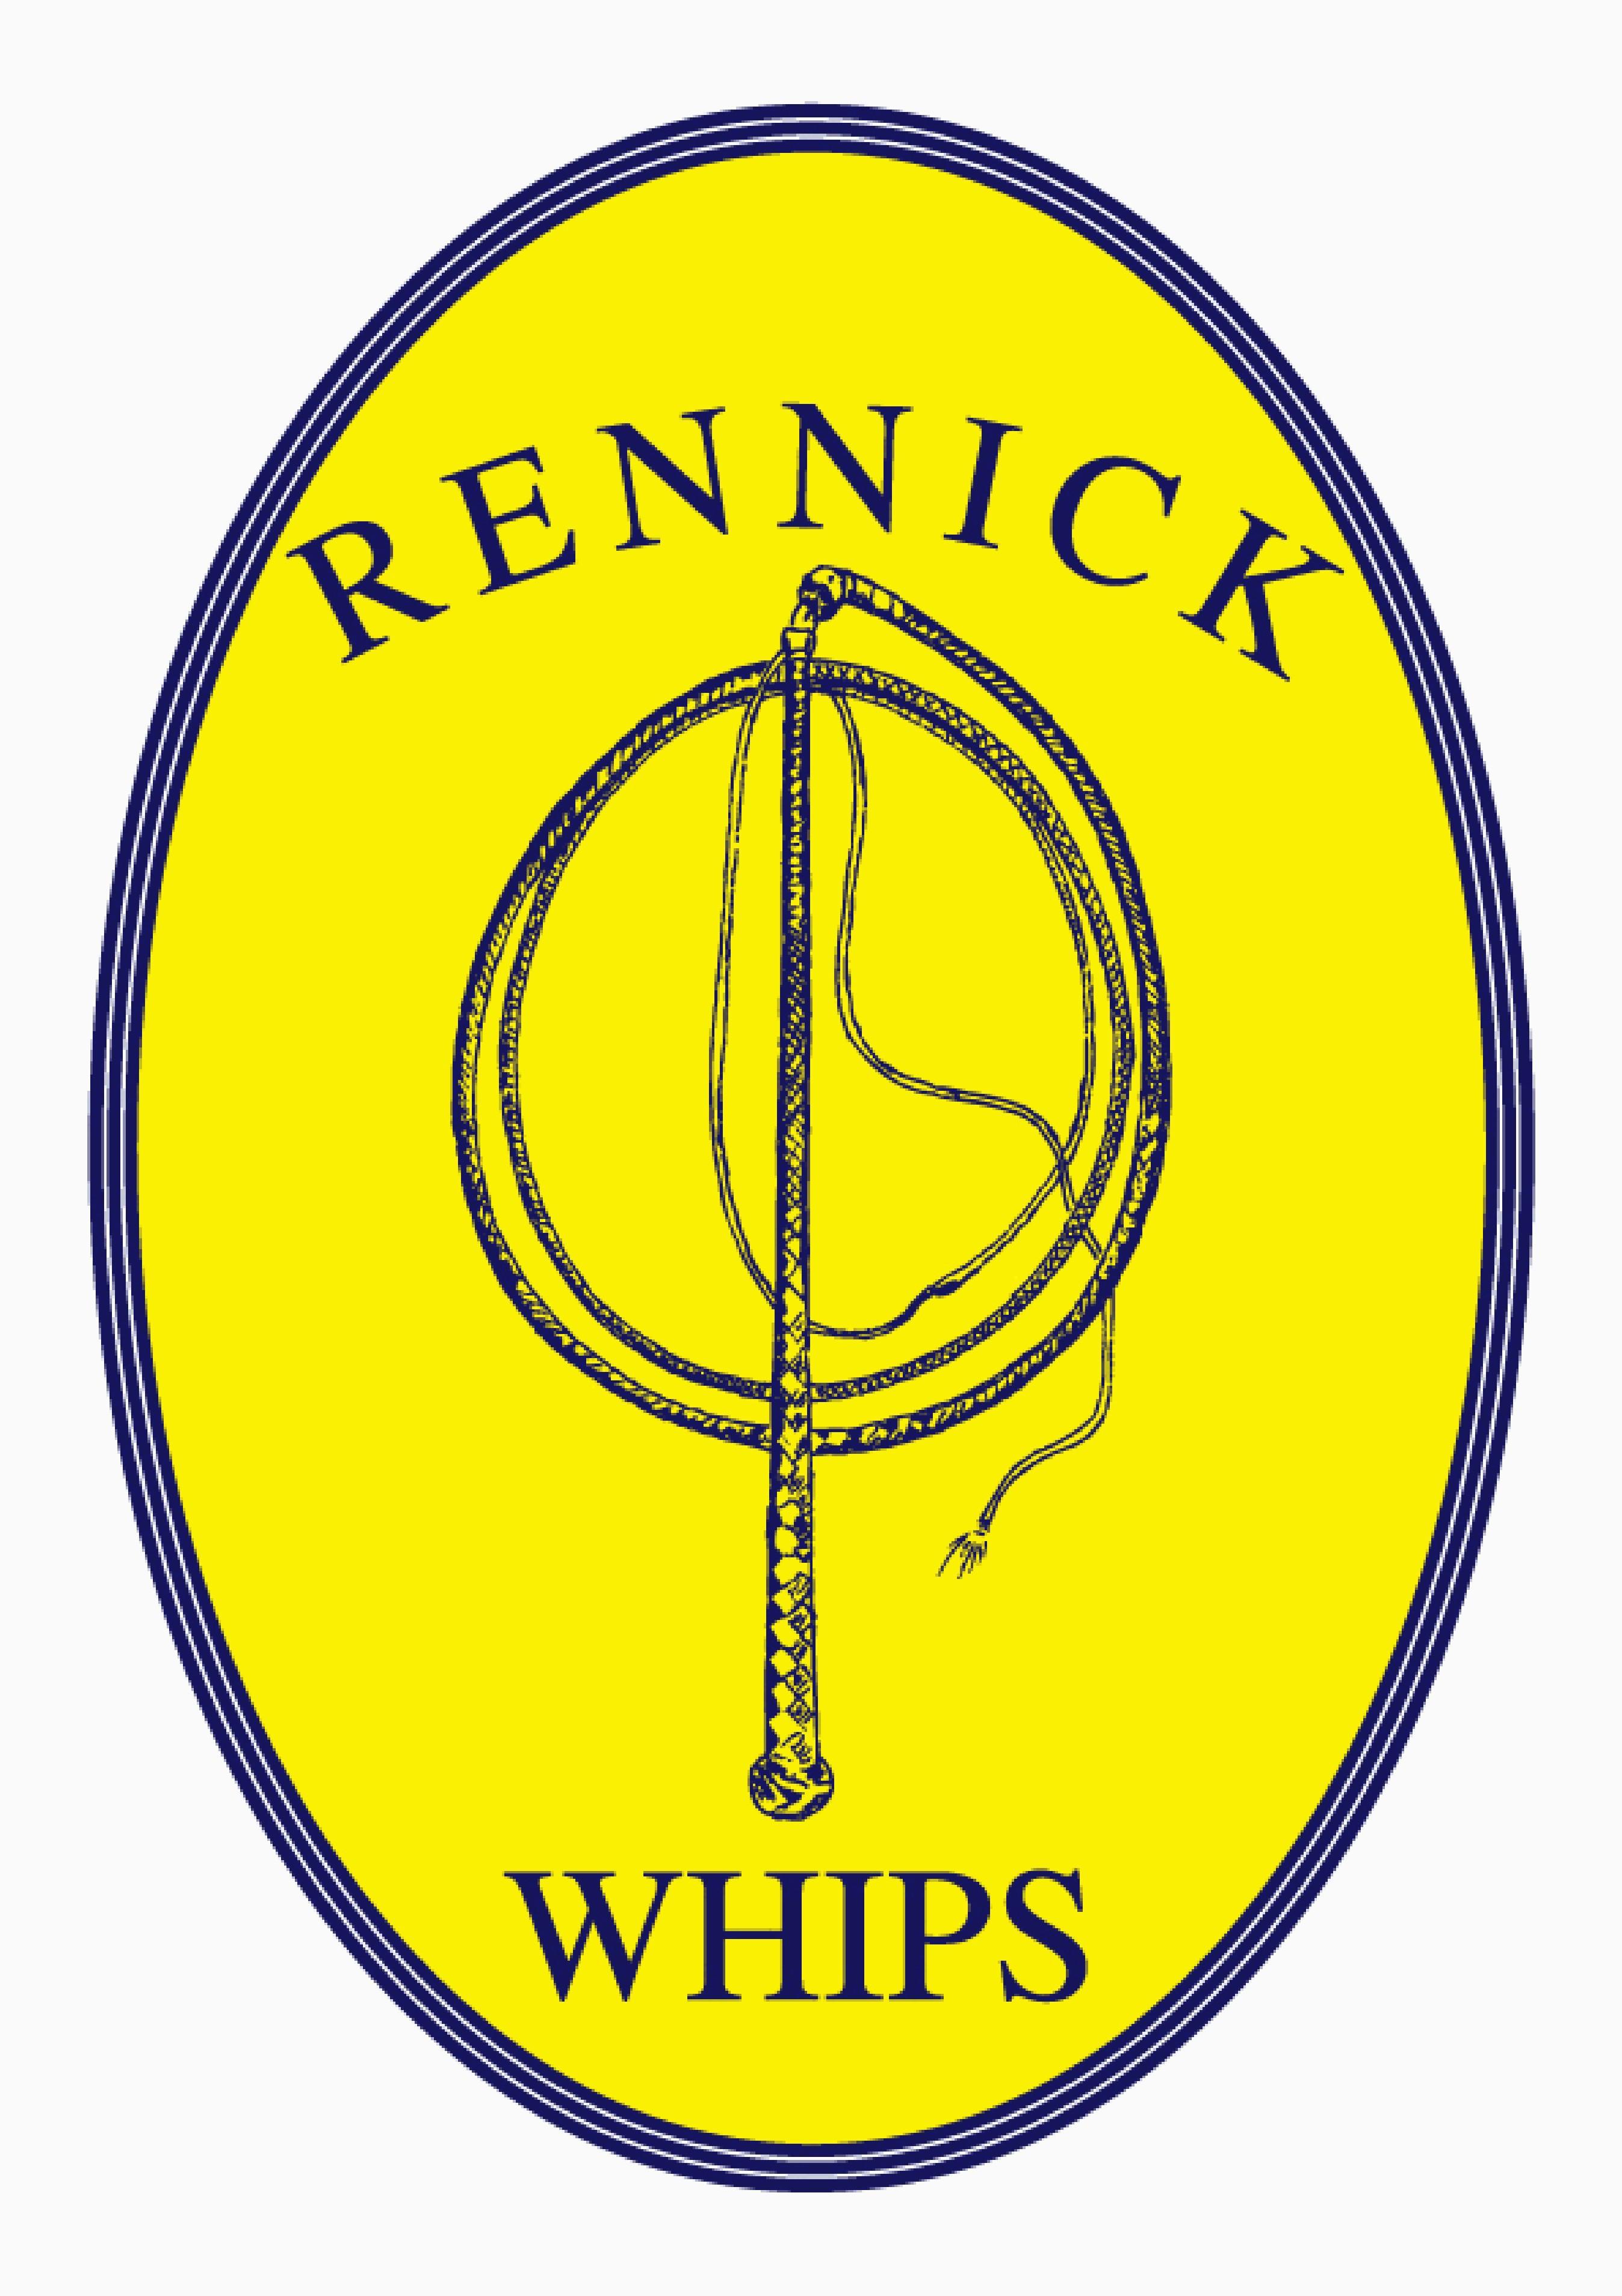 Rennick Whips